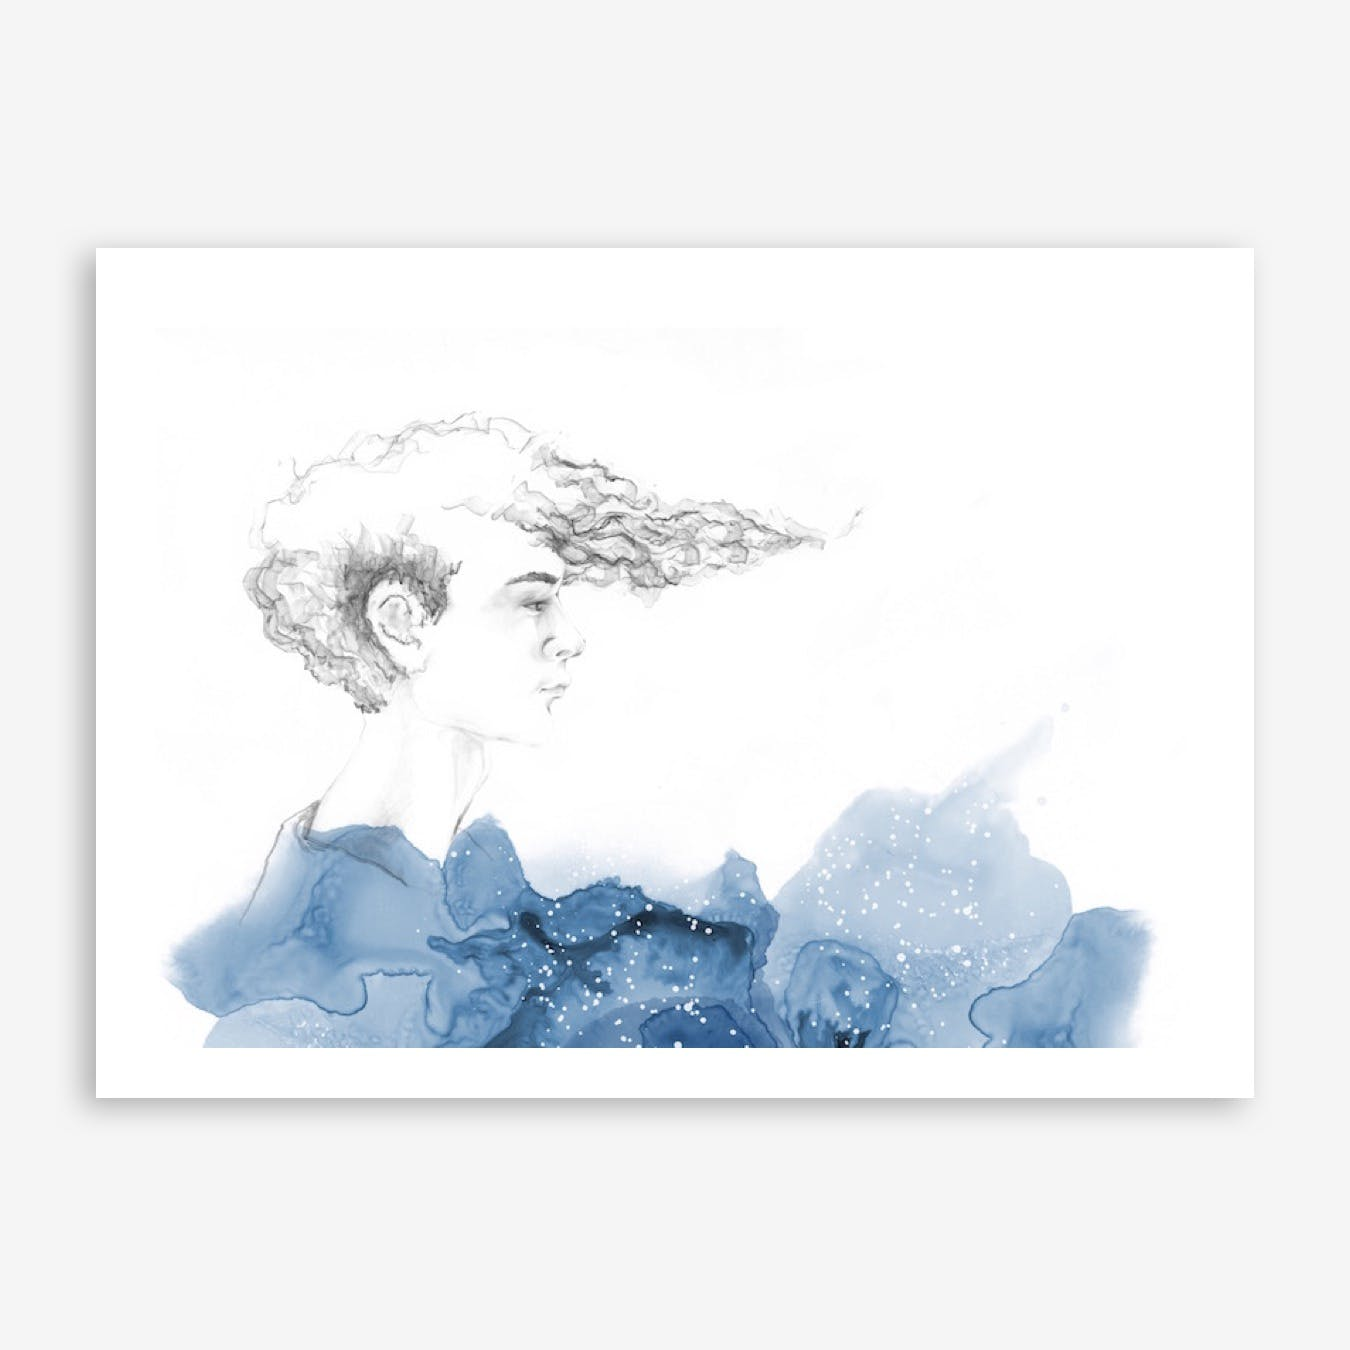 His Seacret Print